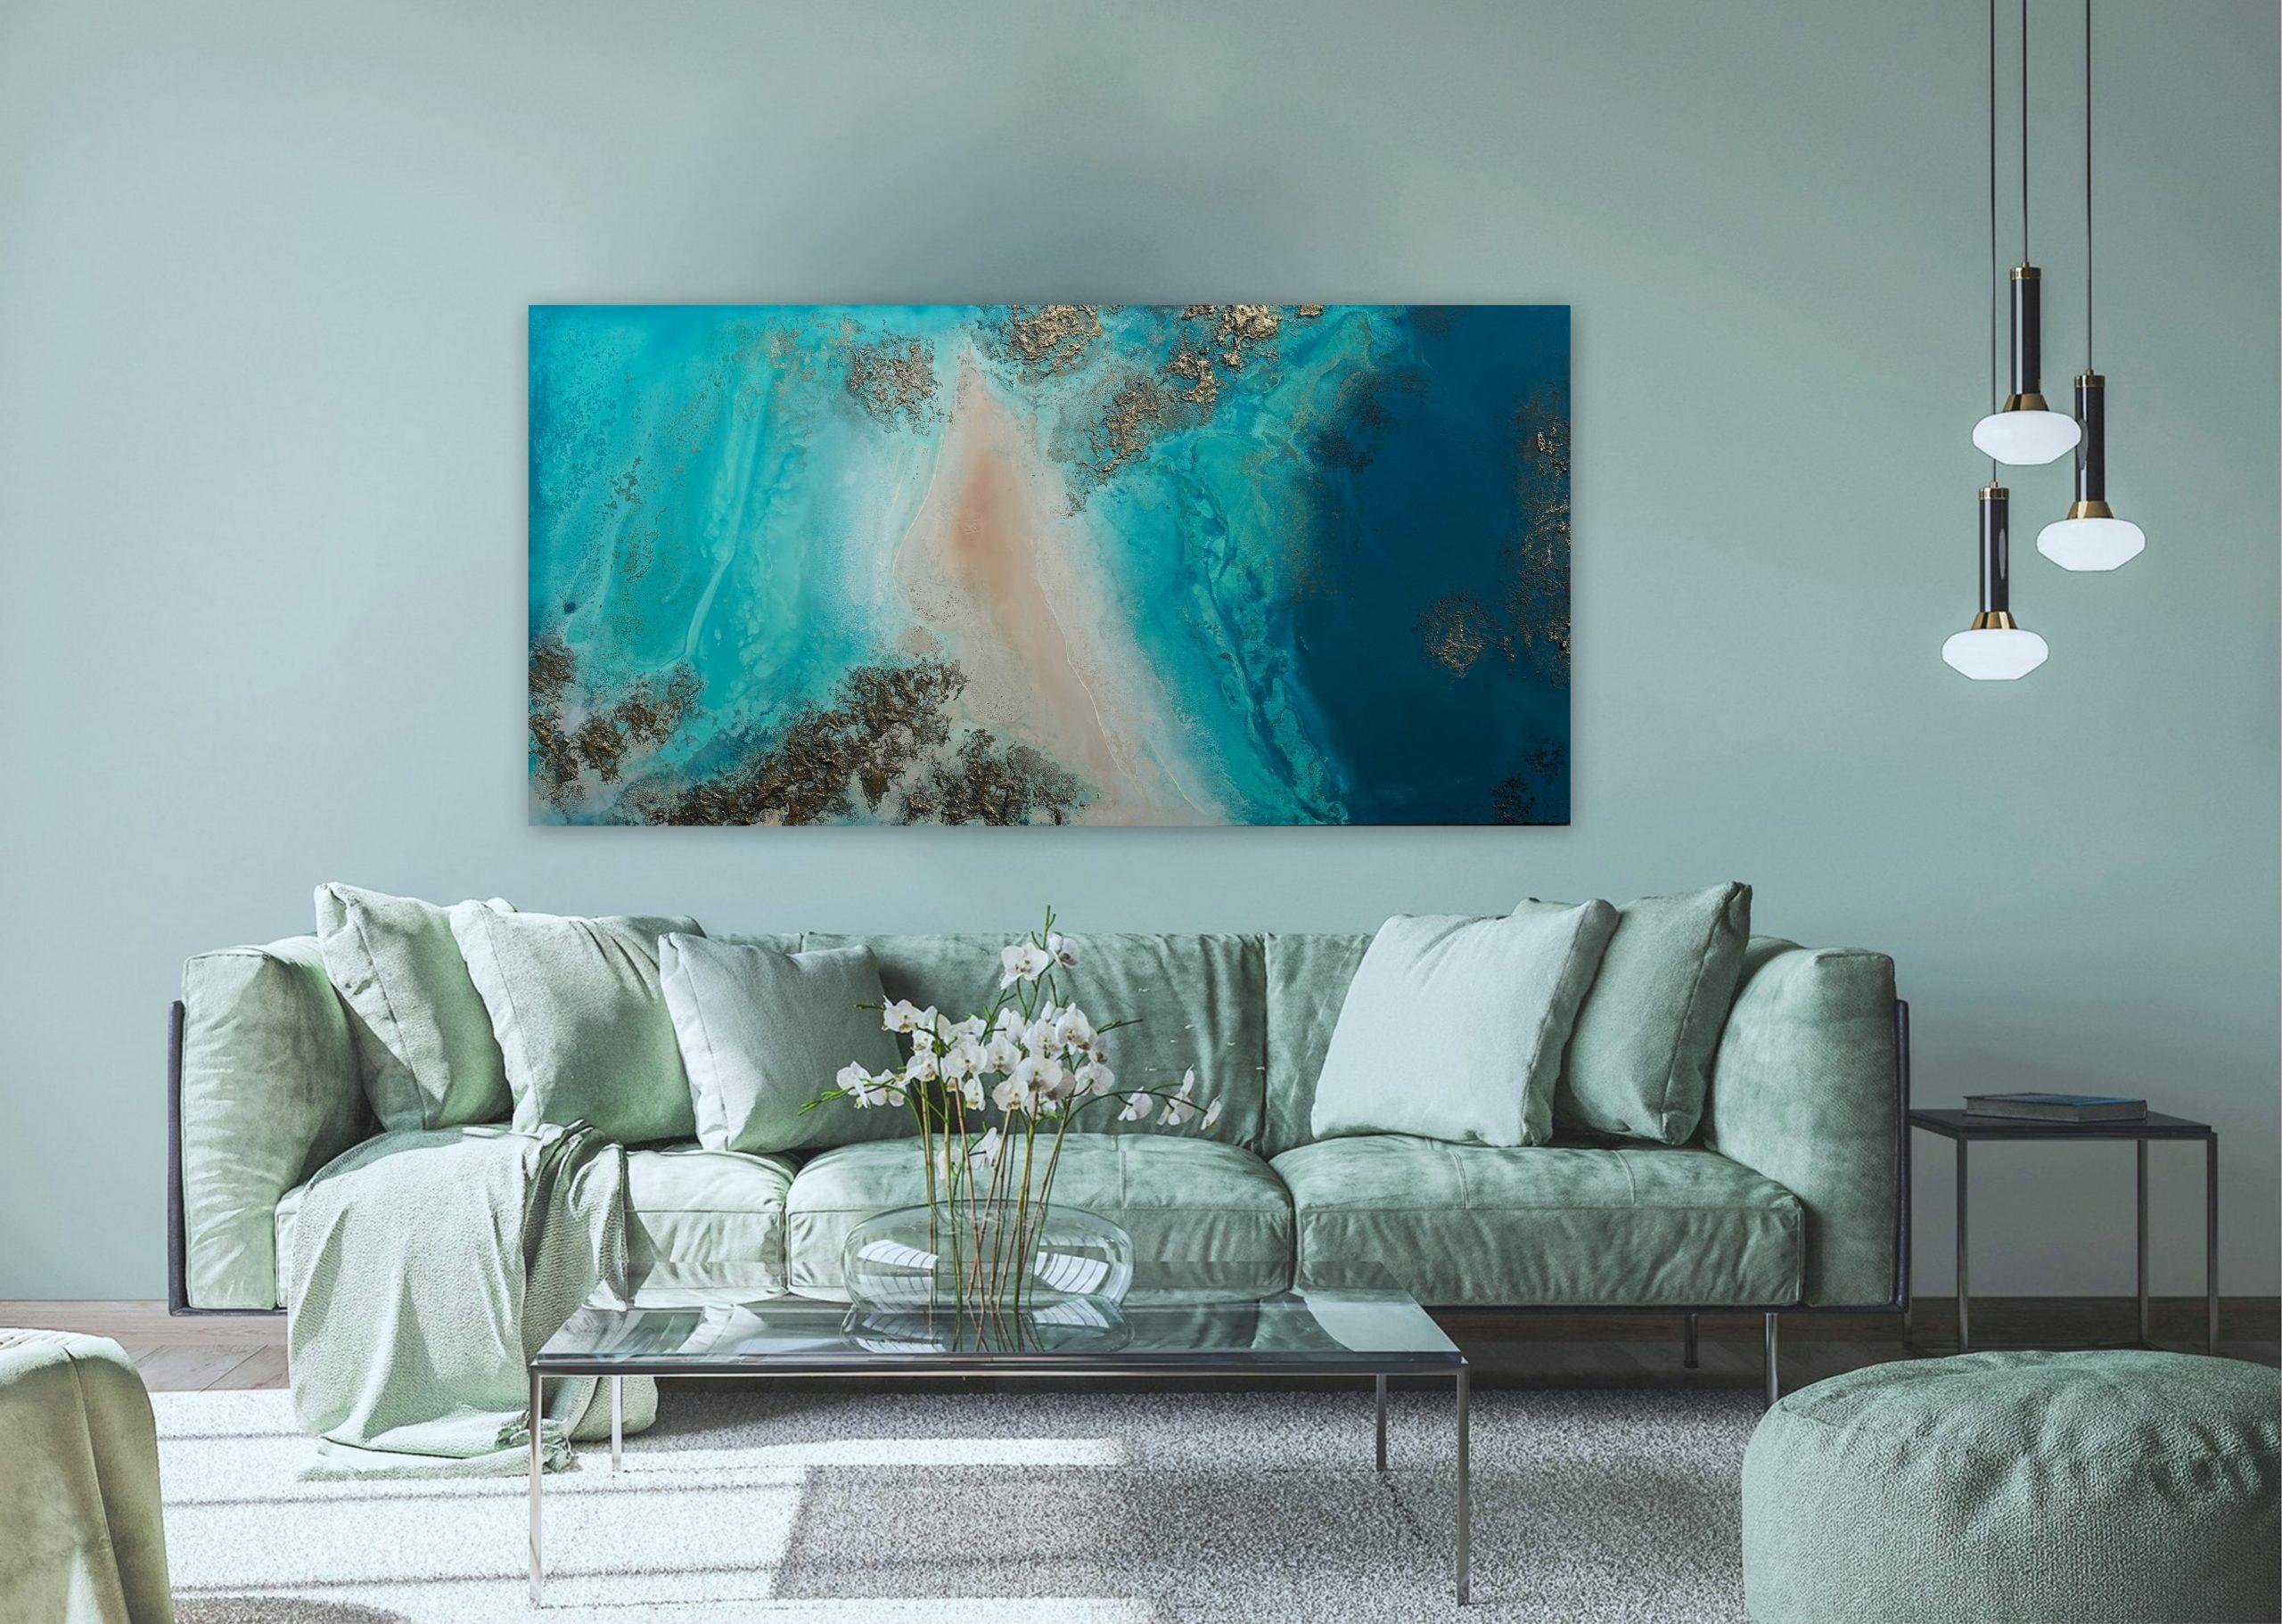 Large Abstract Wall Art Petra Meikle De Vlas20